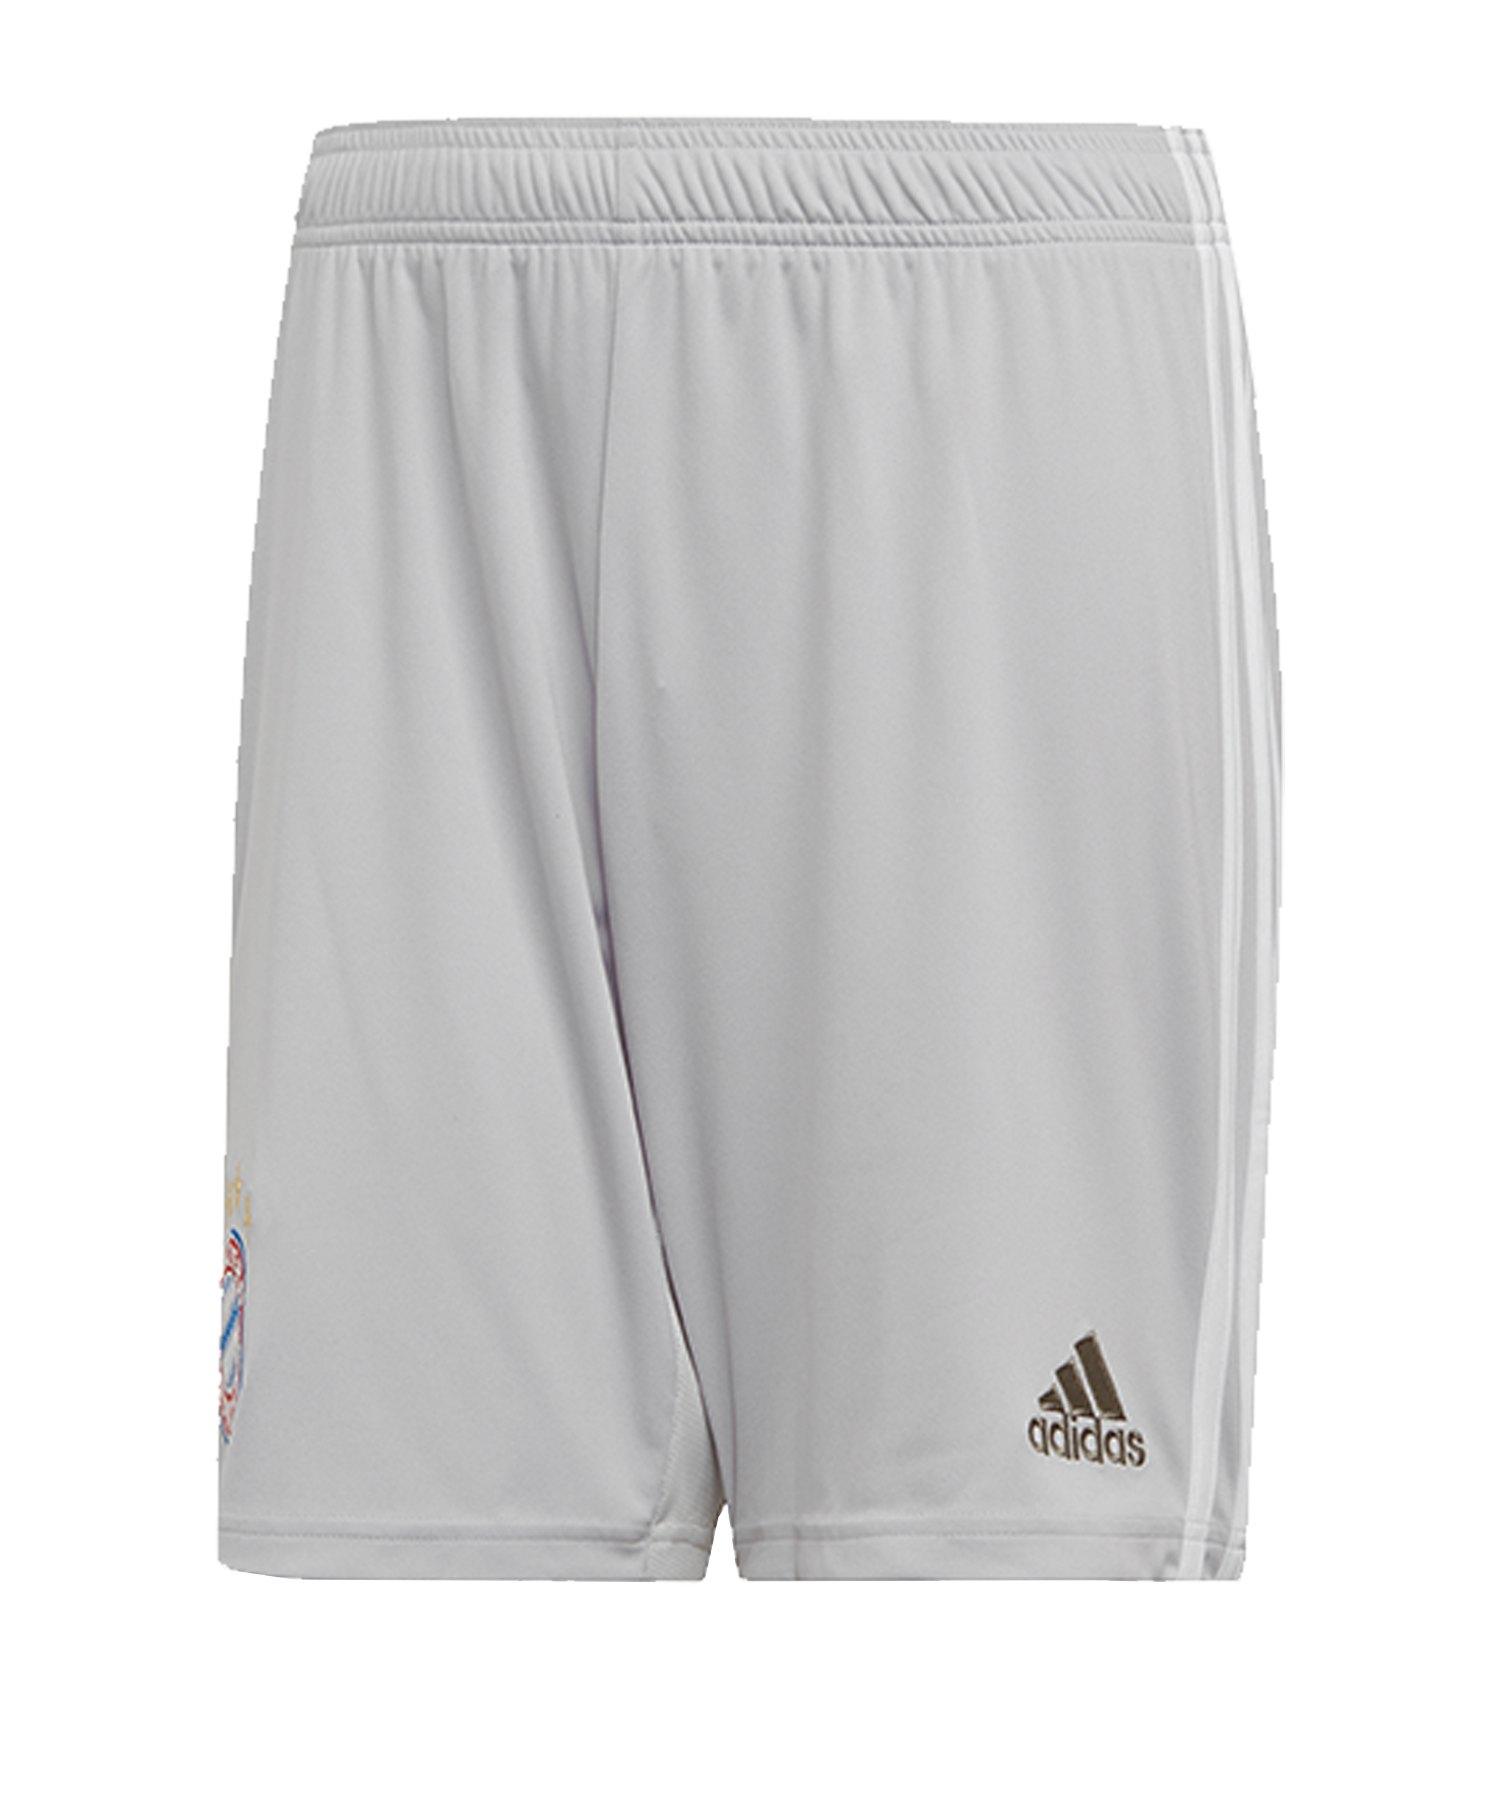 adidas FC Bayern München Short Away 20192020